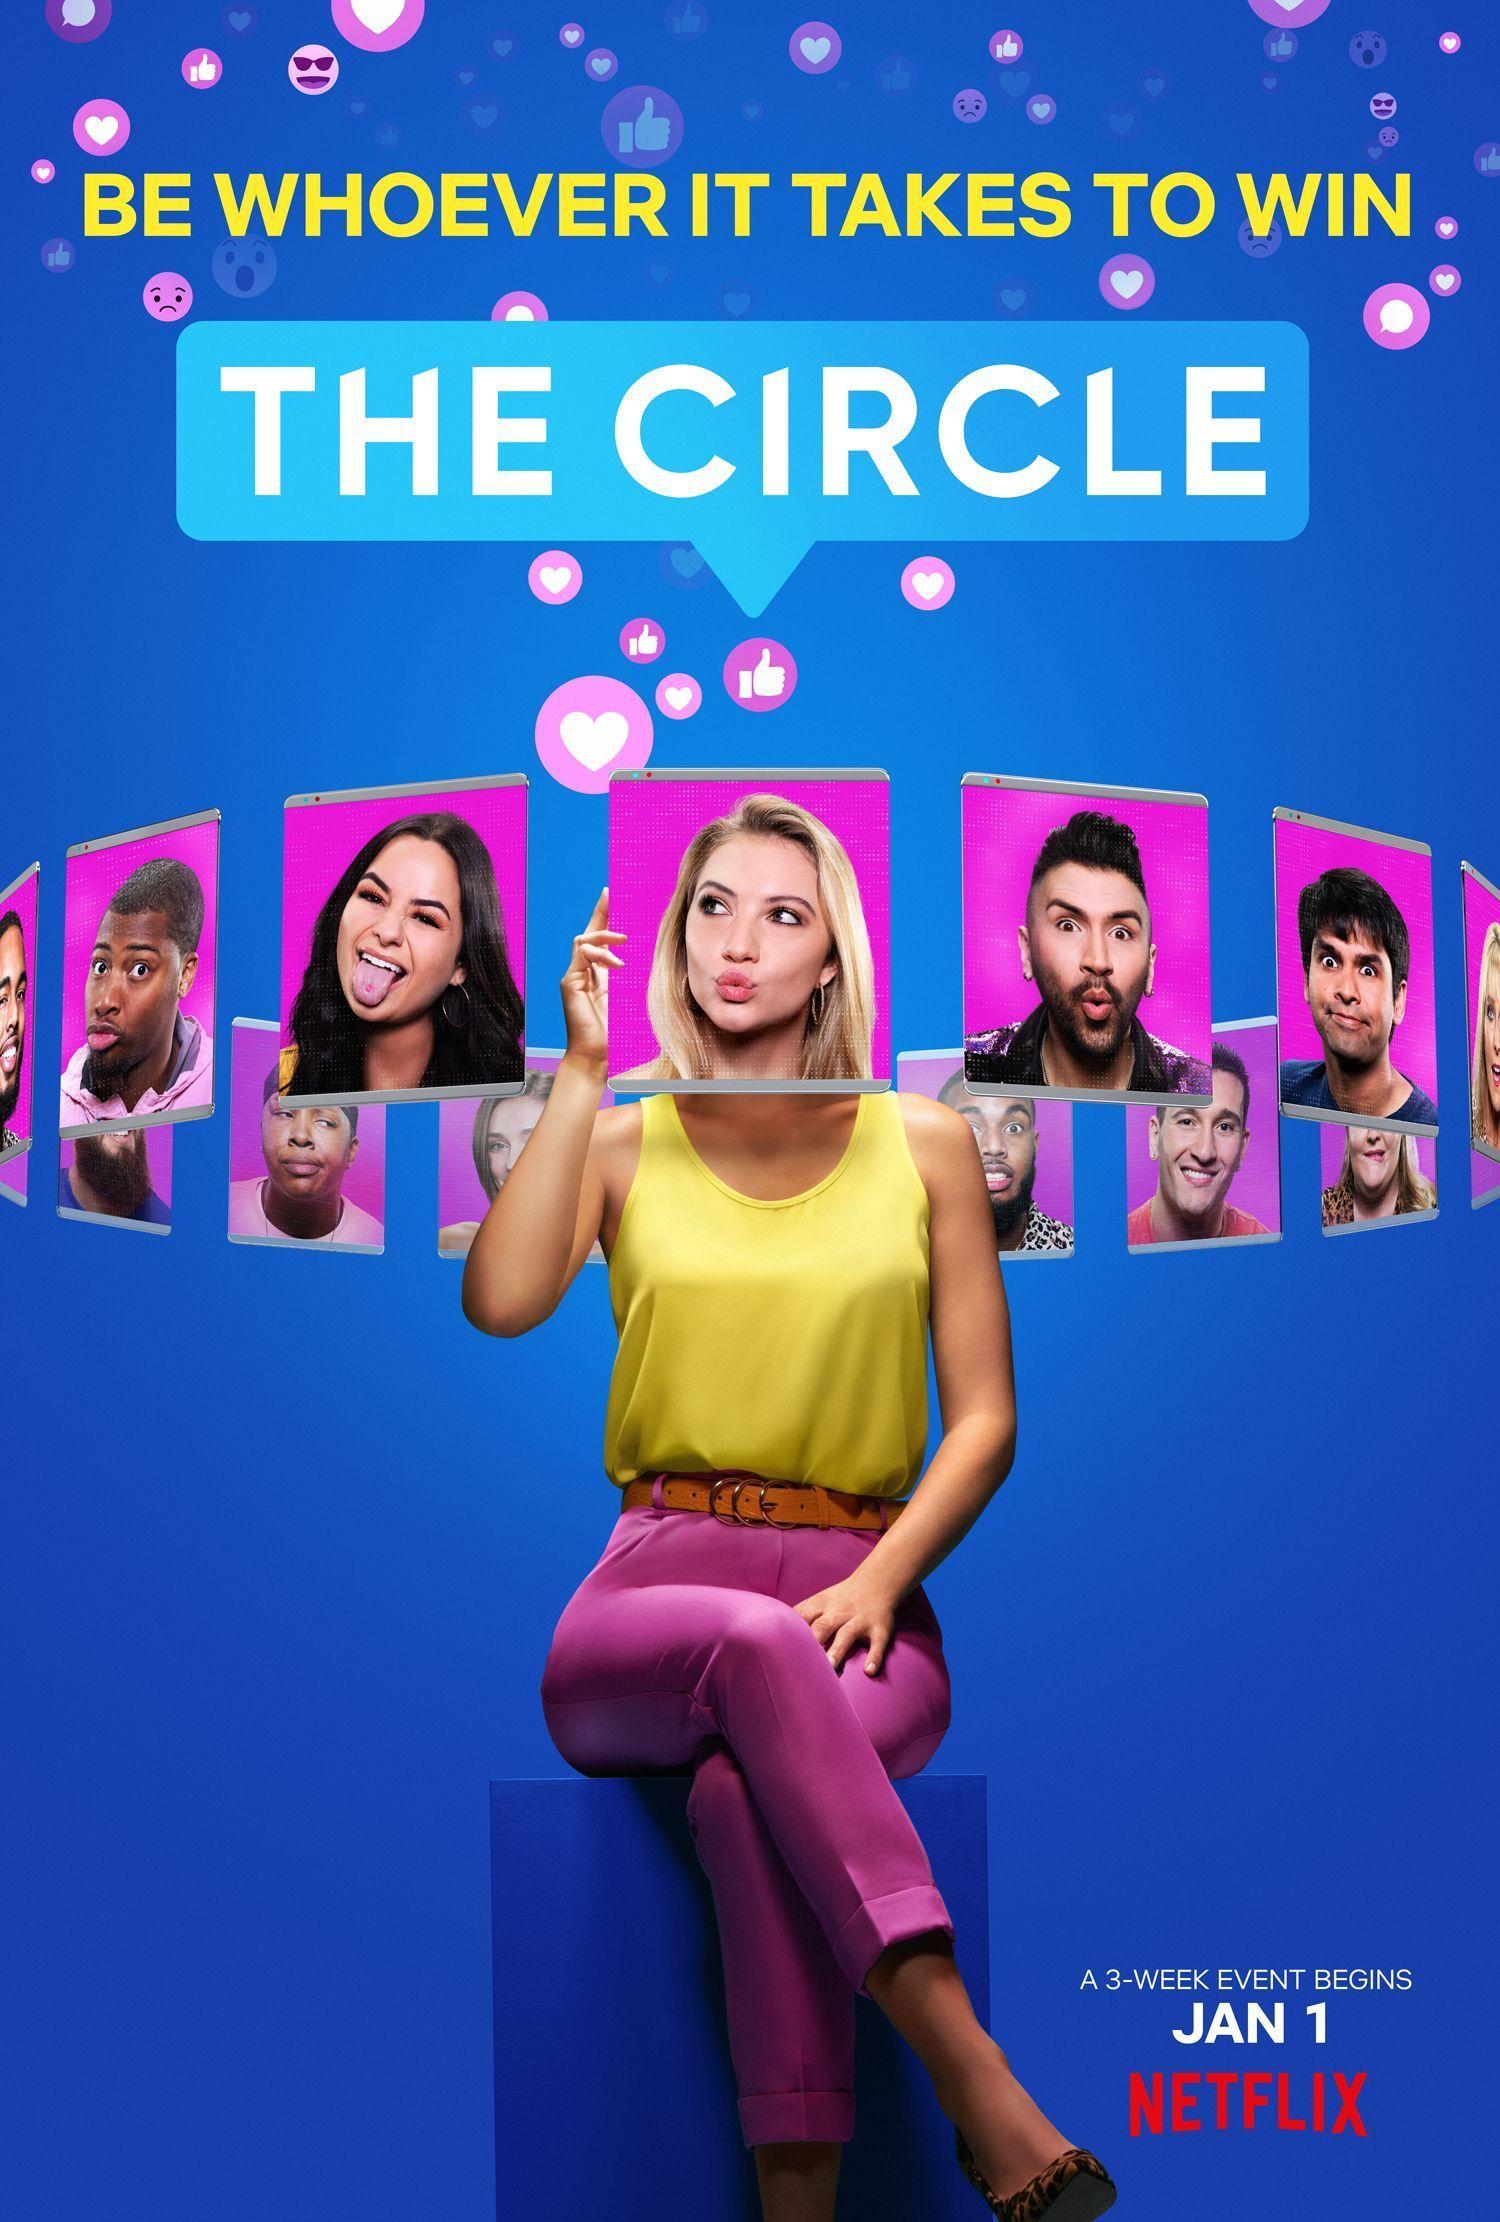 The Circle Netflix Game Review Netflix Shows On Netflix Tv Show Games